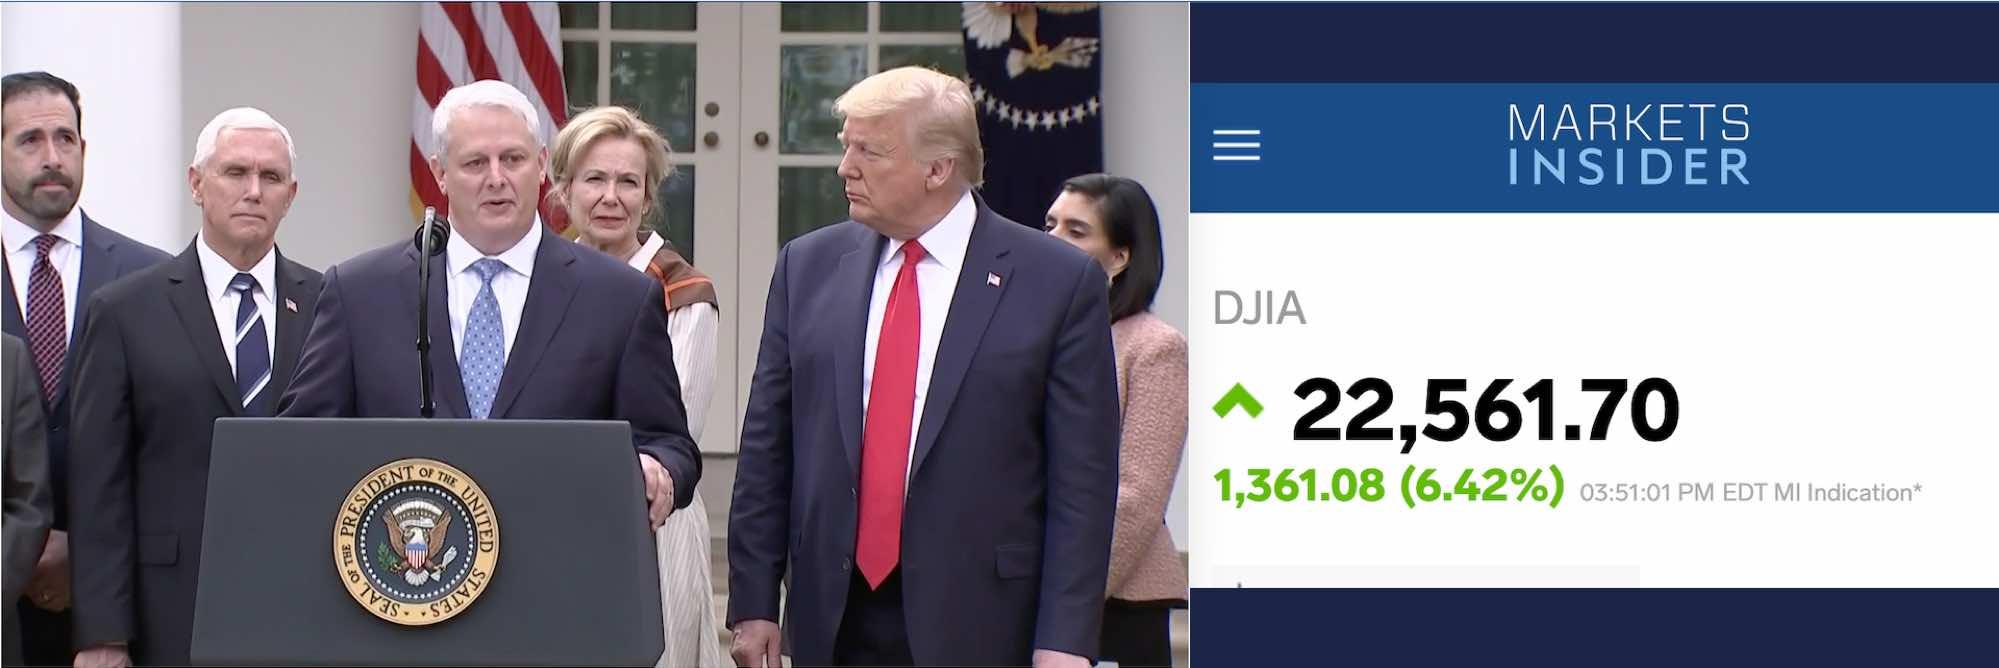 Kayla Tausche Trump CEOs